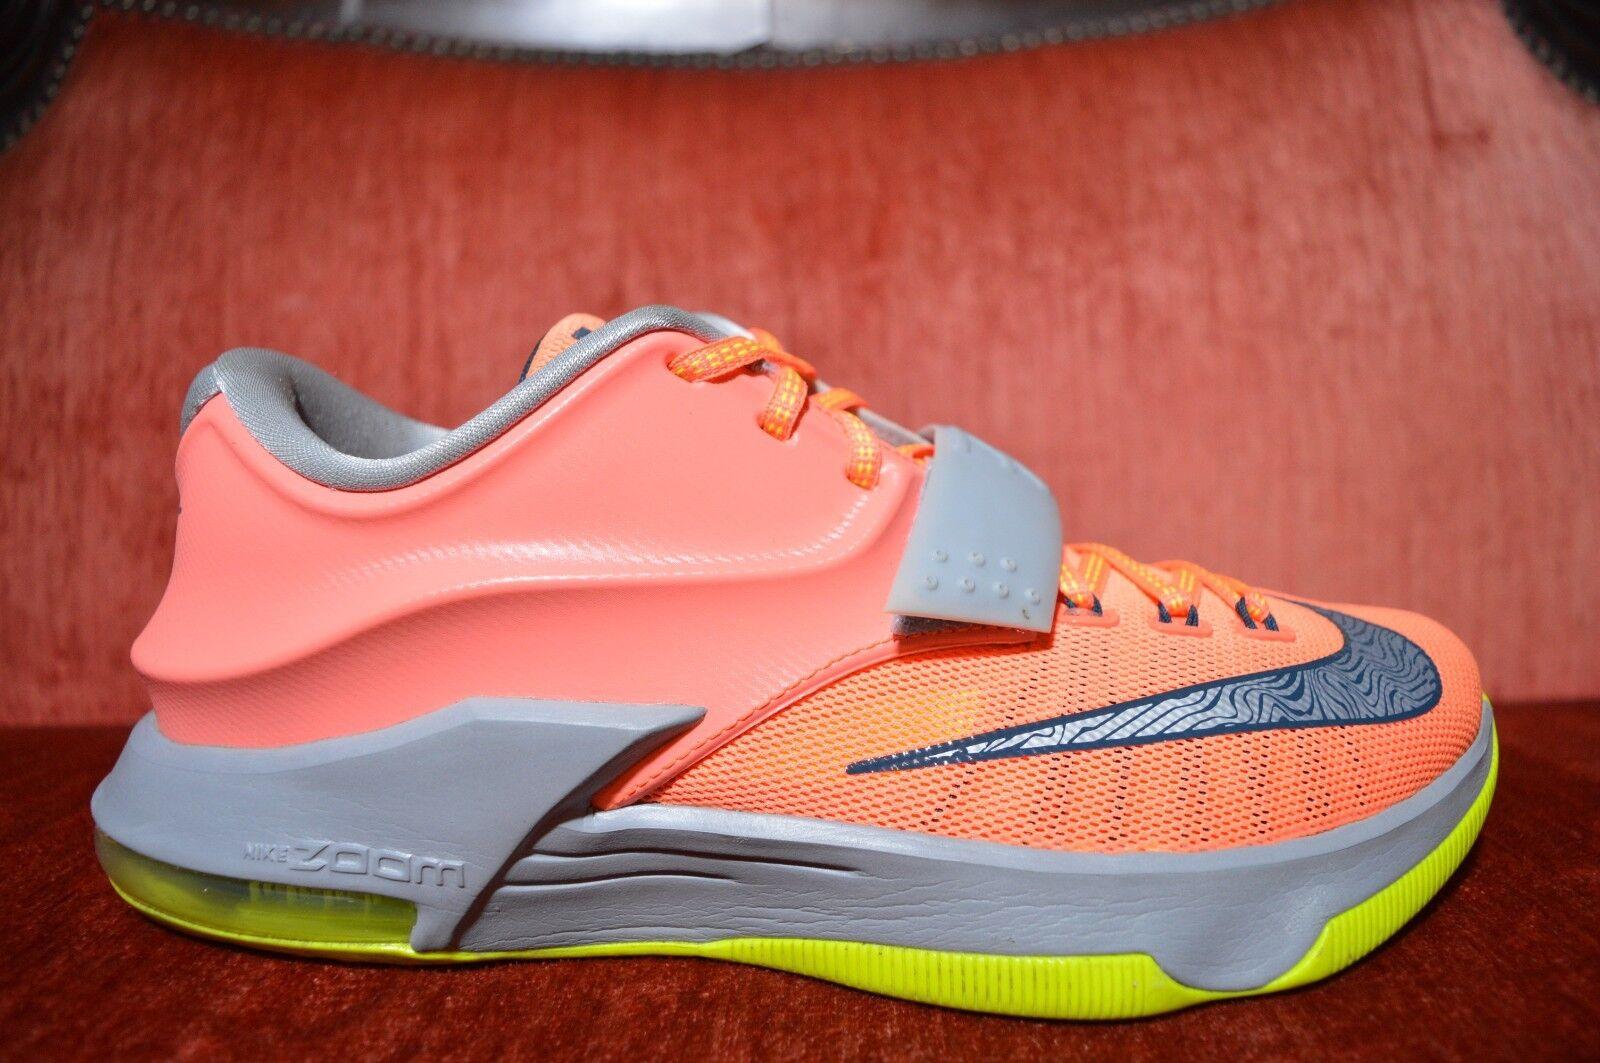 Nike Air Kevin Durant KD 7 VII 35000 DEGREES Orange Green 653996-840 Size 8.5